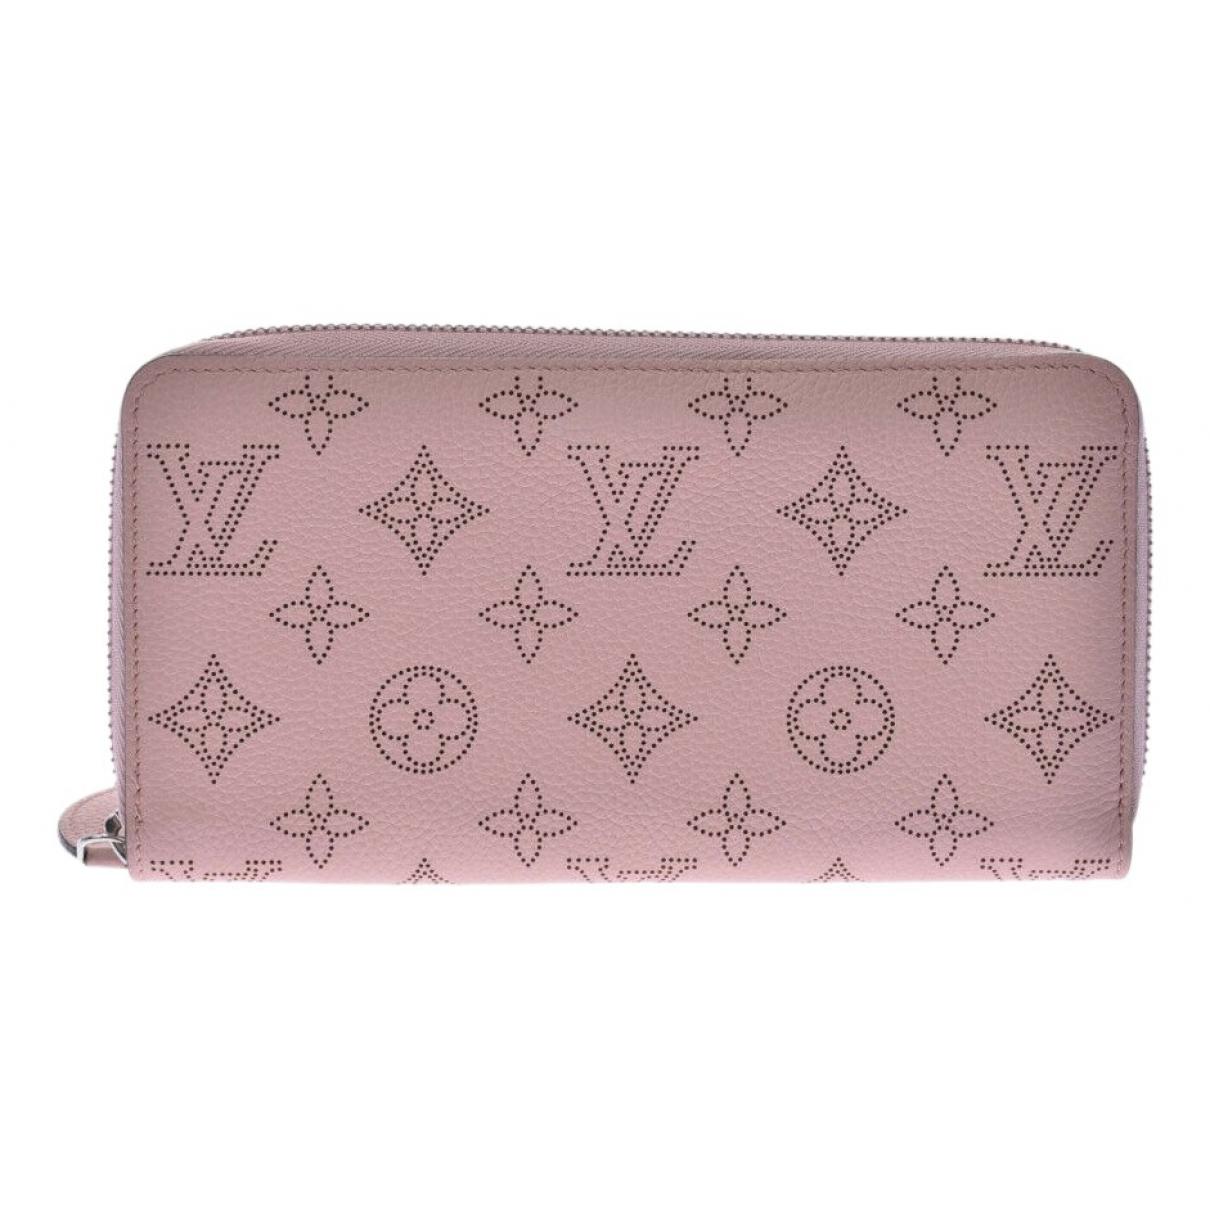 Louis Vuitton Zippy Pink Leather wallet for Women \N